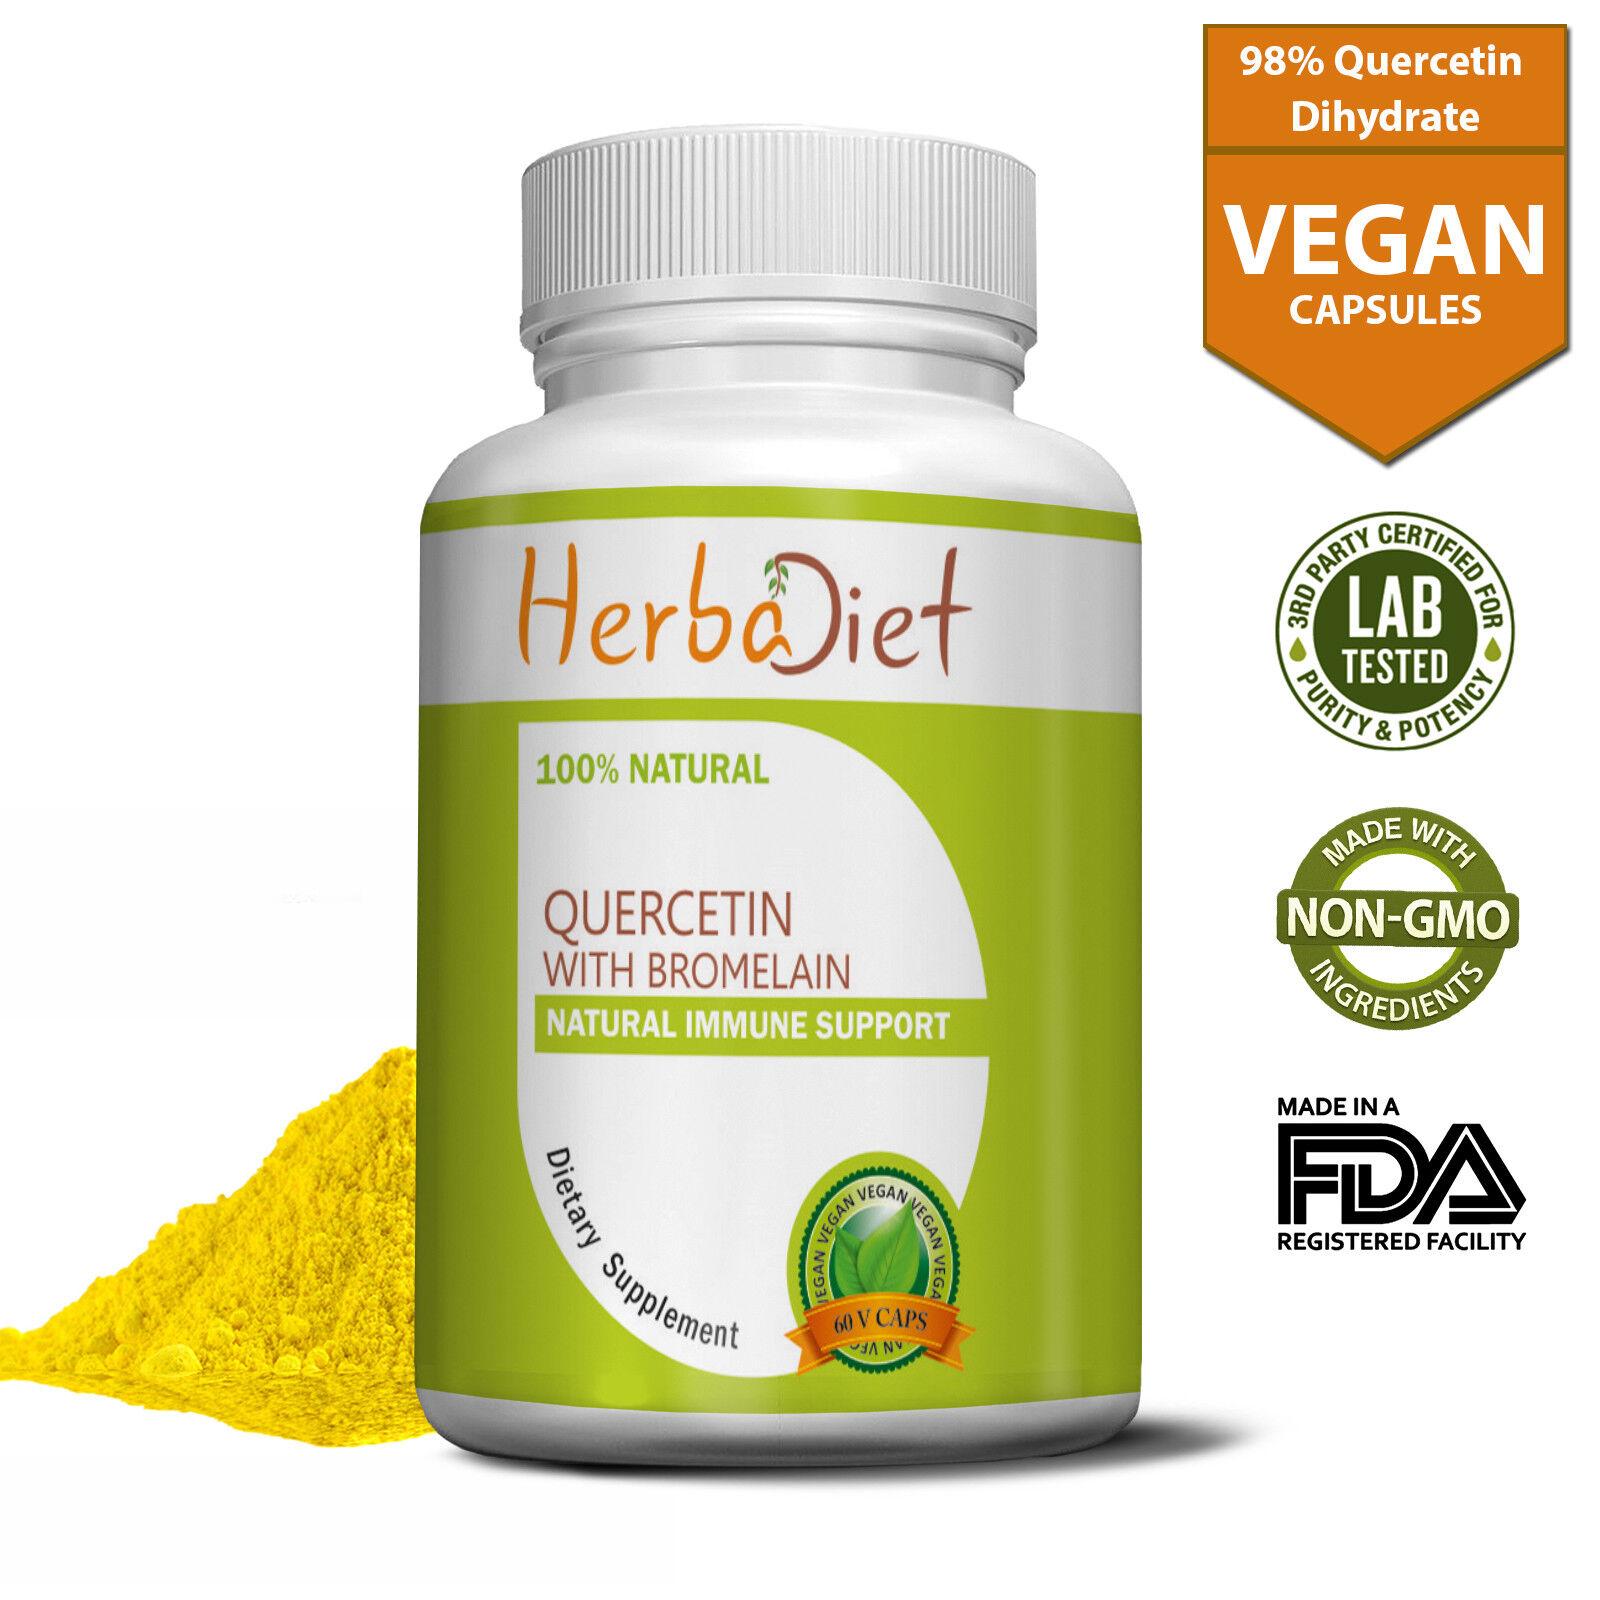 Quercetin with Bromelain Vcaps 500mg Vegetarian Capsules Immune Cardio Support